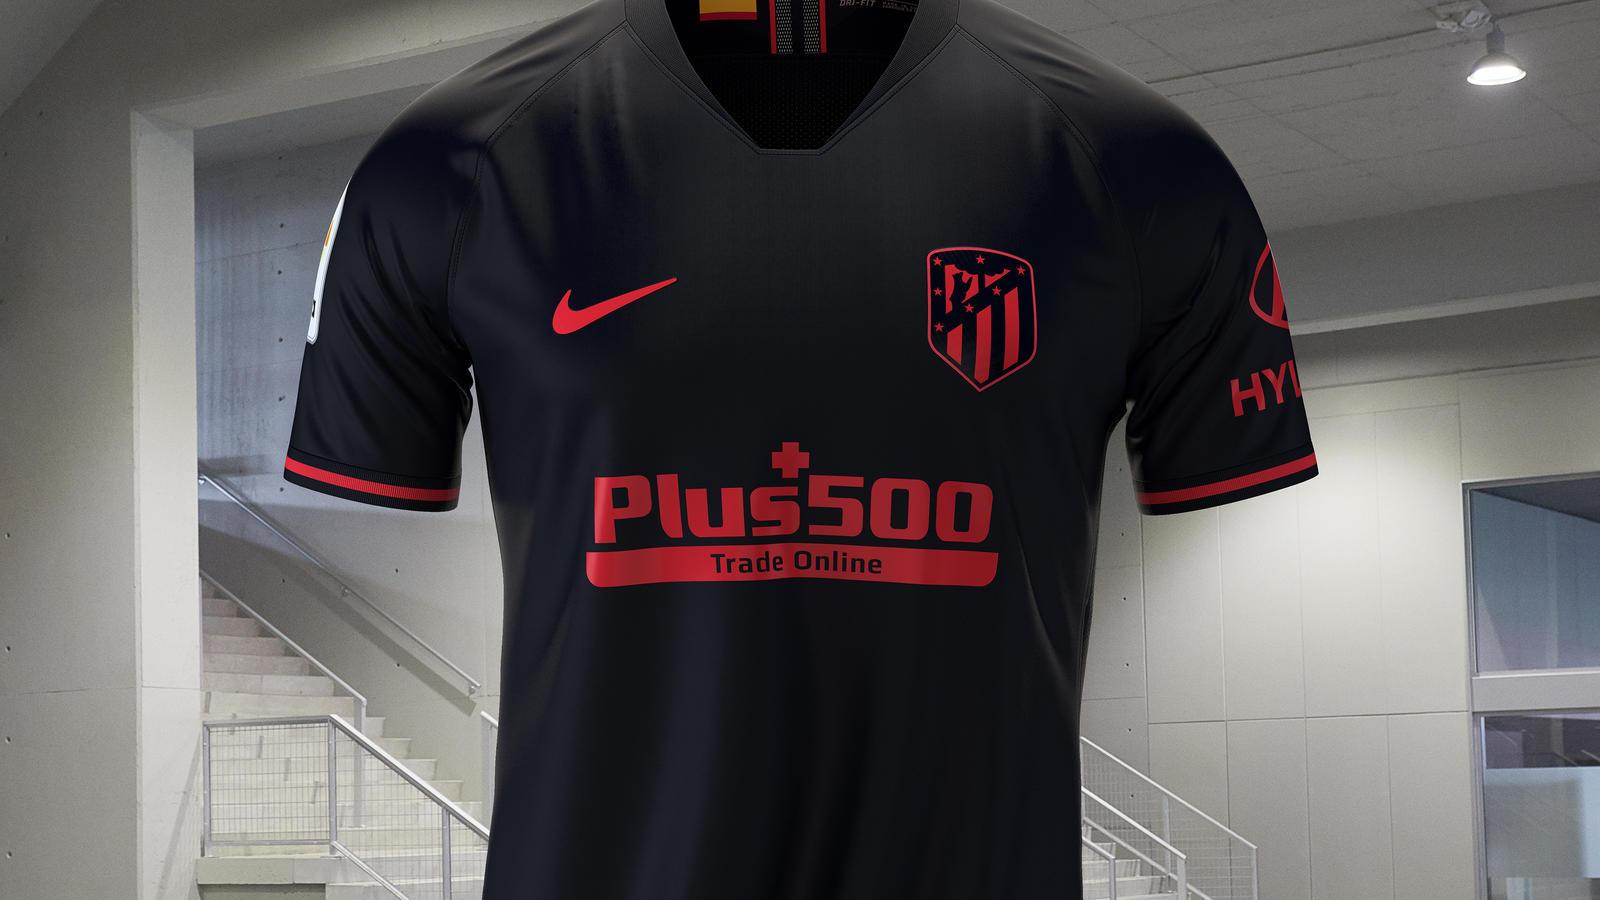 atletico-madrid-away-kit-2019-20